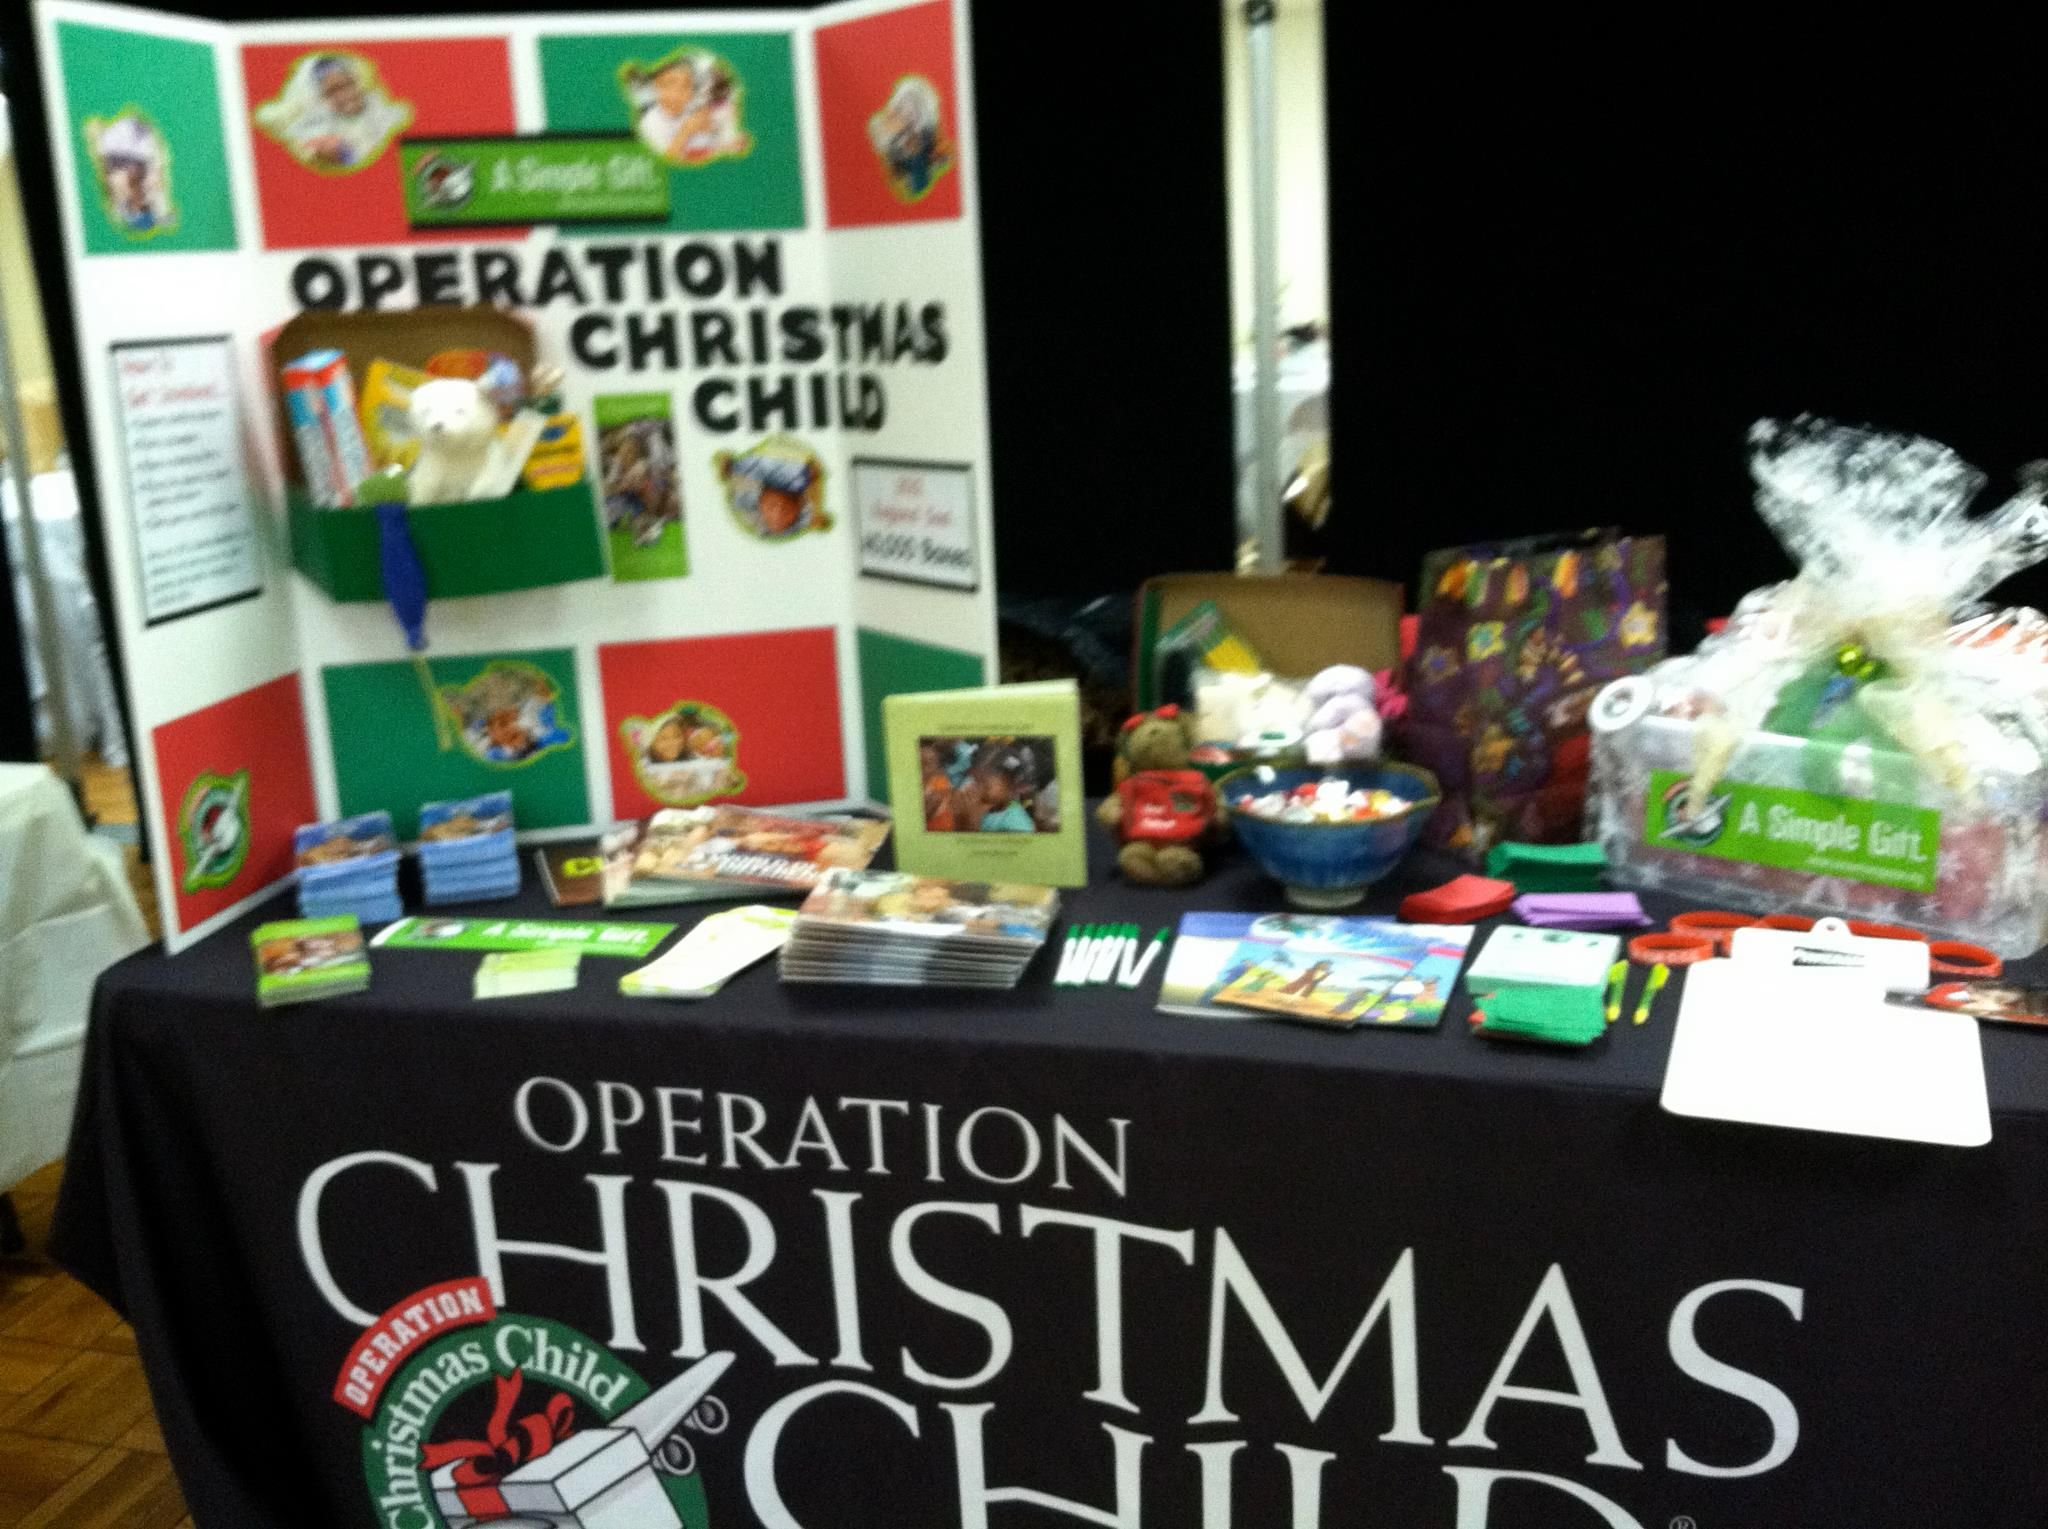 Operation Christmas Child Shoebox Display.Occ Nw Pennsylvania S Display Love The Shoe Box On The